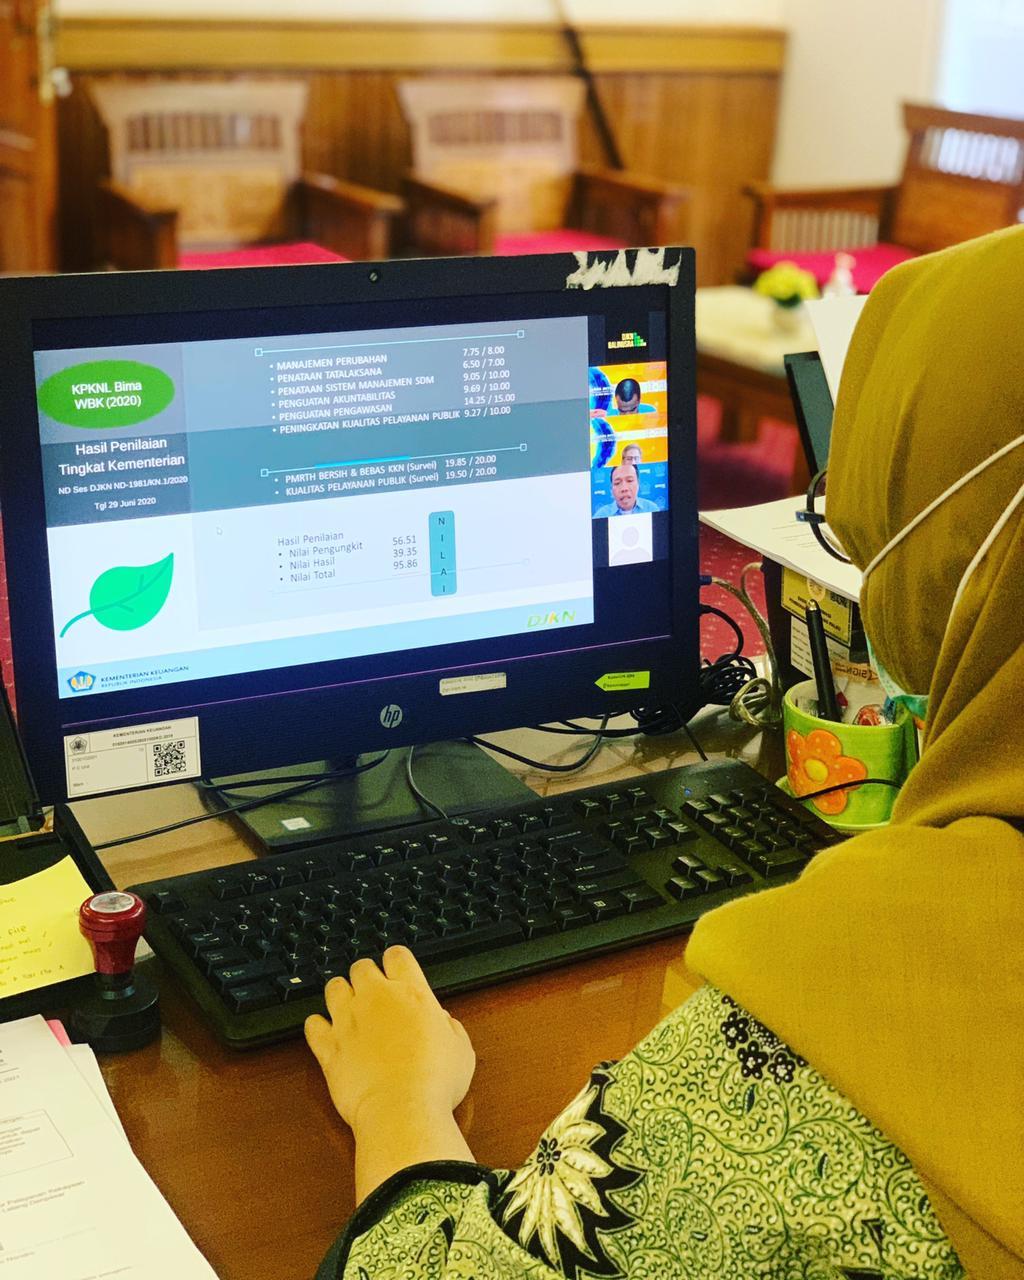 Dukung Pembangunan ZI WBK Kanwil DJKN Balinusra, Kepala KPKNL Bima berbagi Pengalaman Memperoleh Prediket WBK 2020